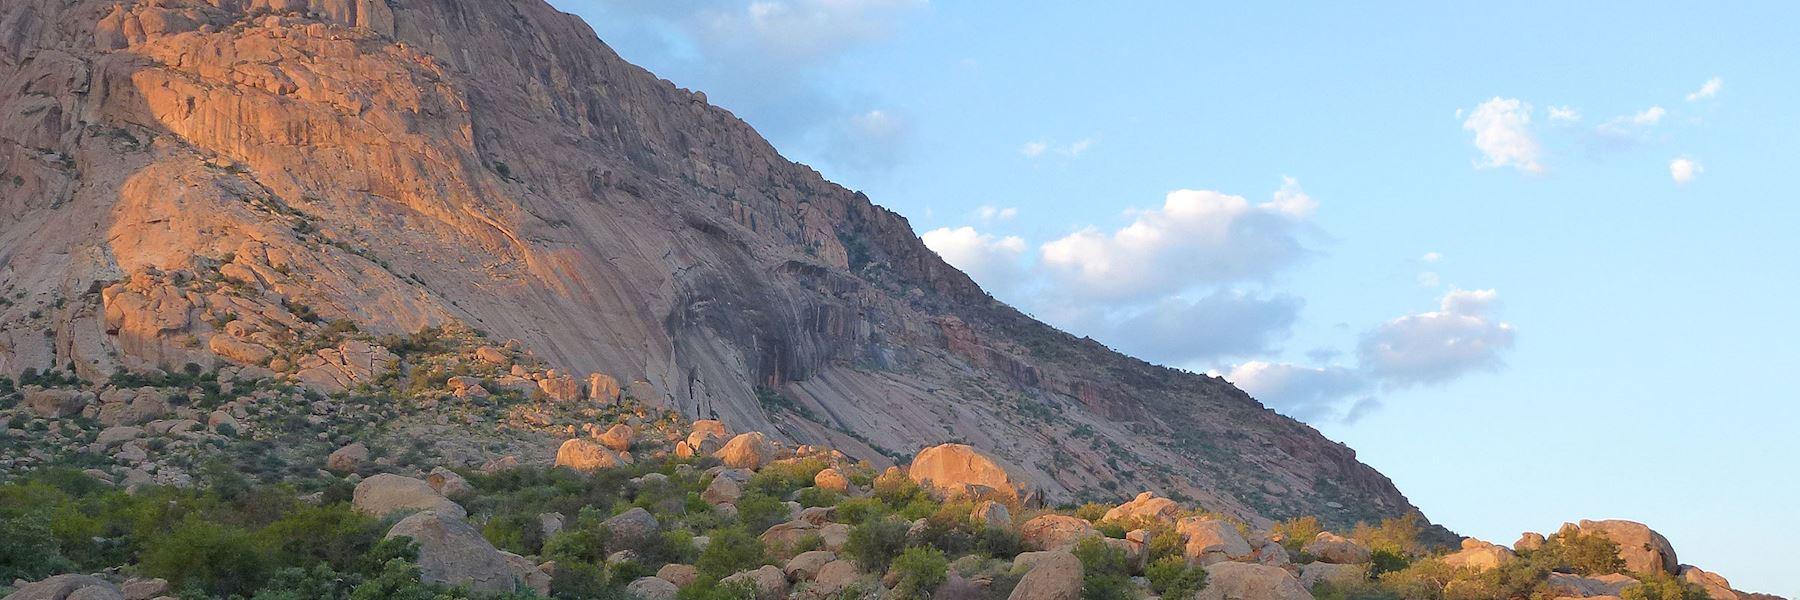 Visit Erongo Mountains, Namibia